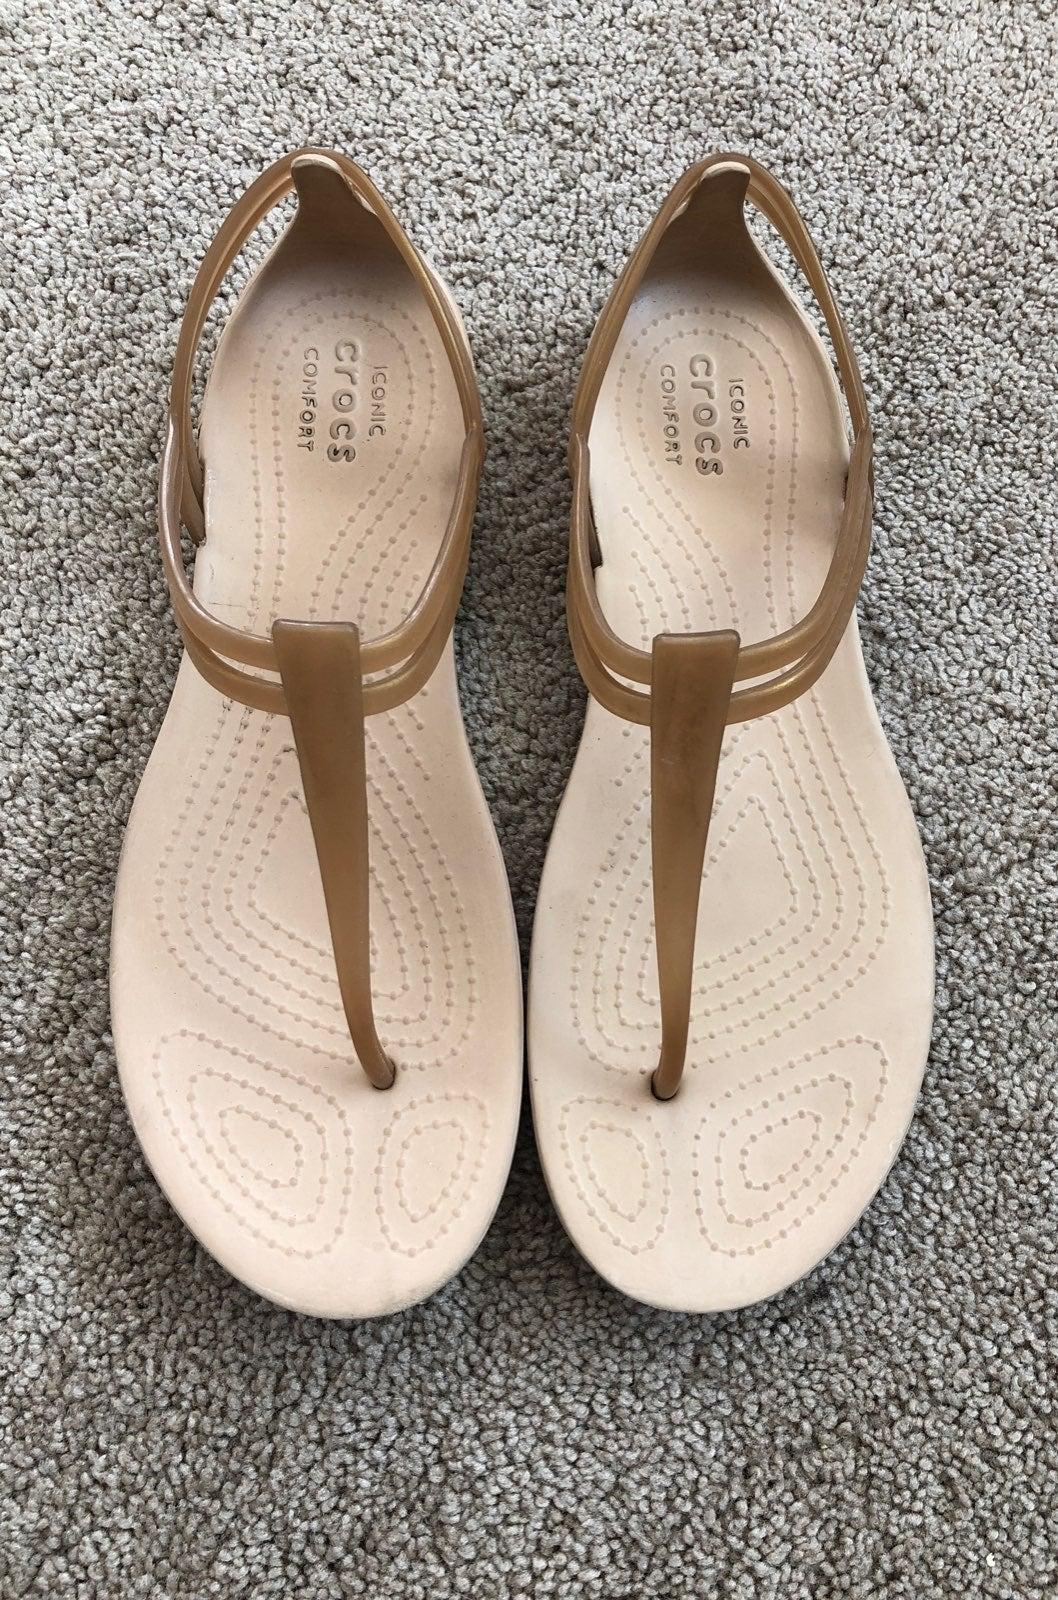 Crocs women's sandals 7.5us